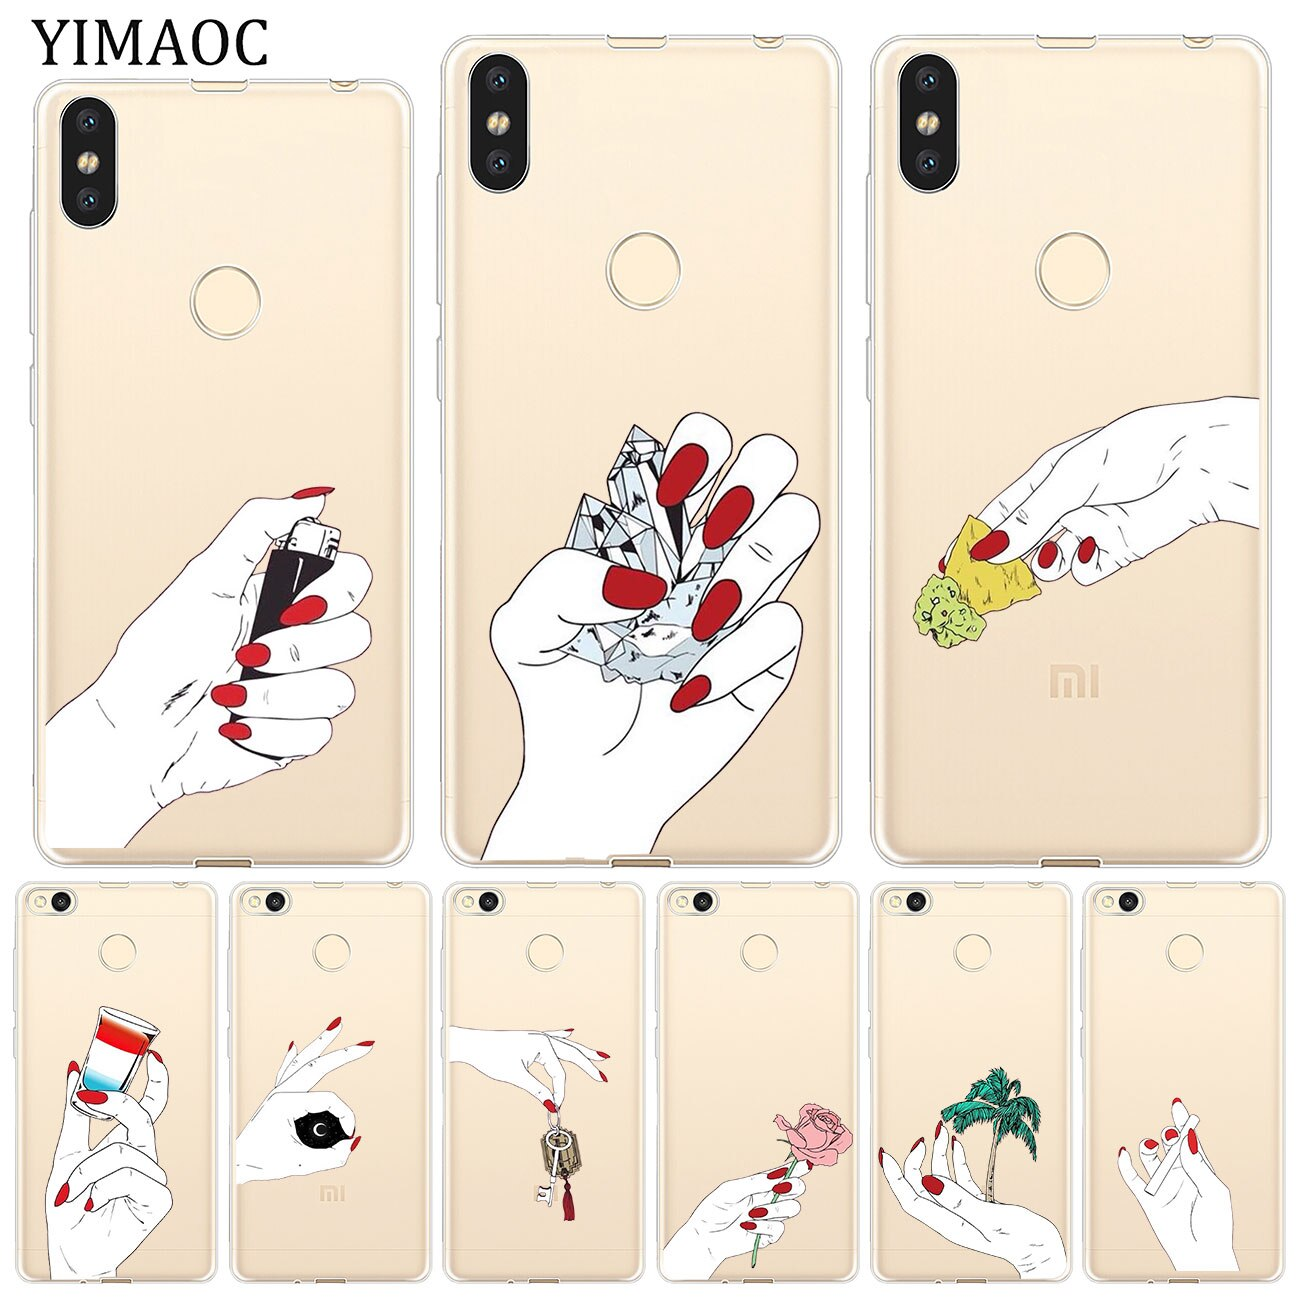 YIMAOC girl hand Starry sky flower Soft Case for Xiaomi Mi 9 9T CC9 CC9E A3 Pro 8 SE A2 Lite A1 MiX